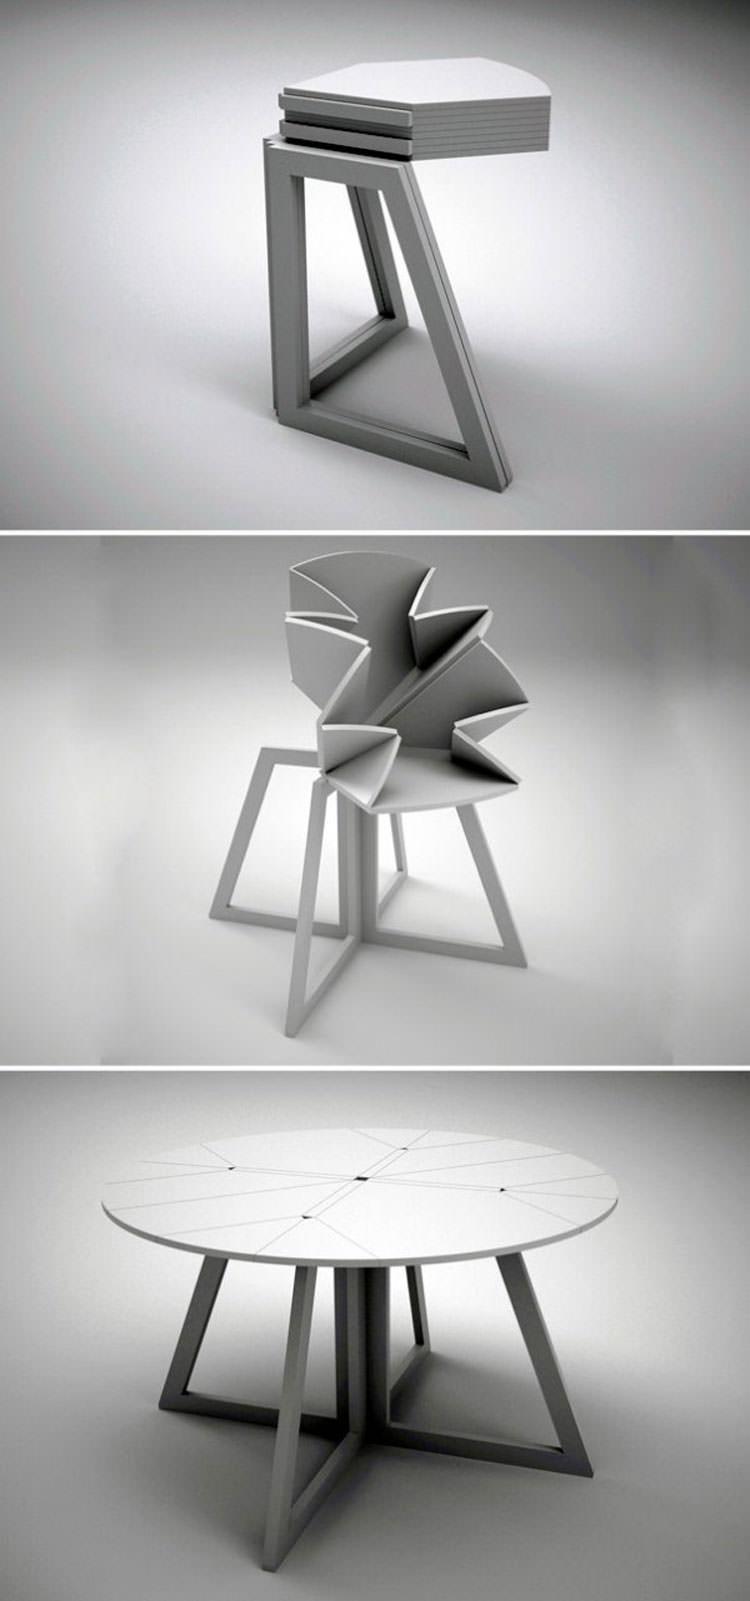 30 tavoli allungabili moderni dal design particolare for Tavolo rotondo allungabile design moderno